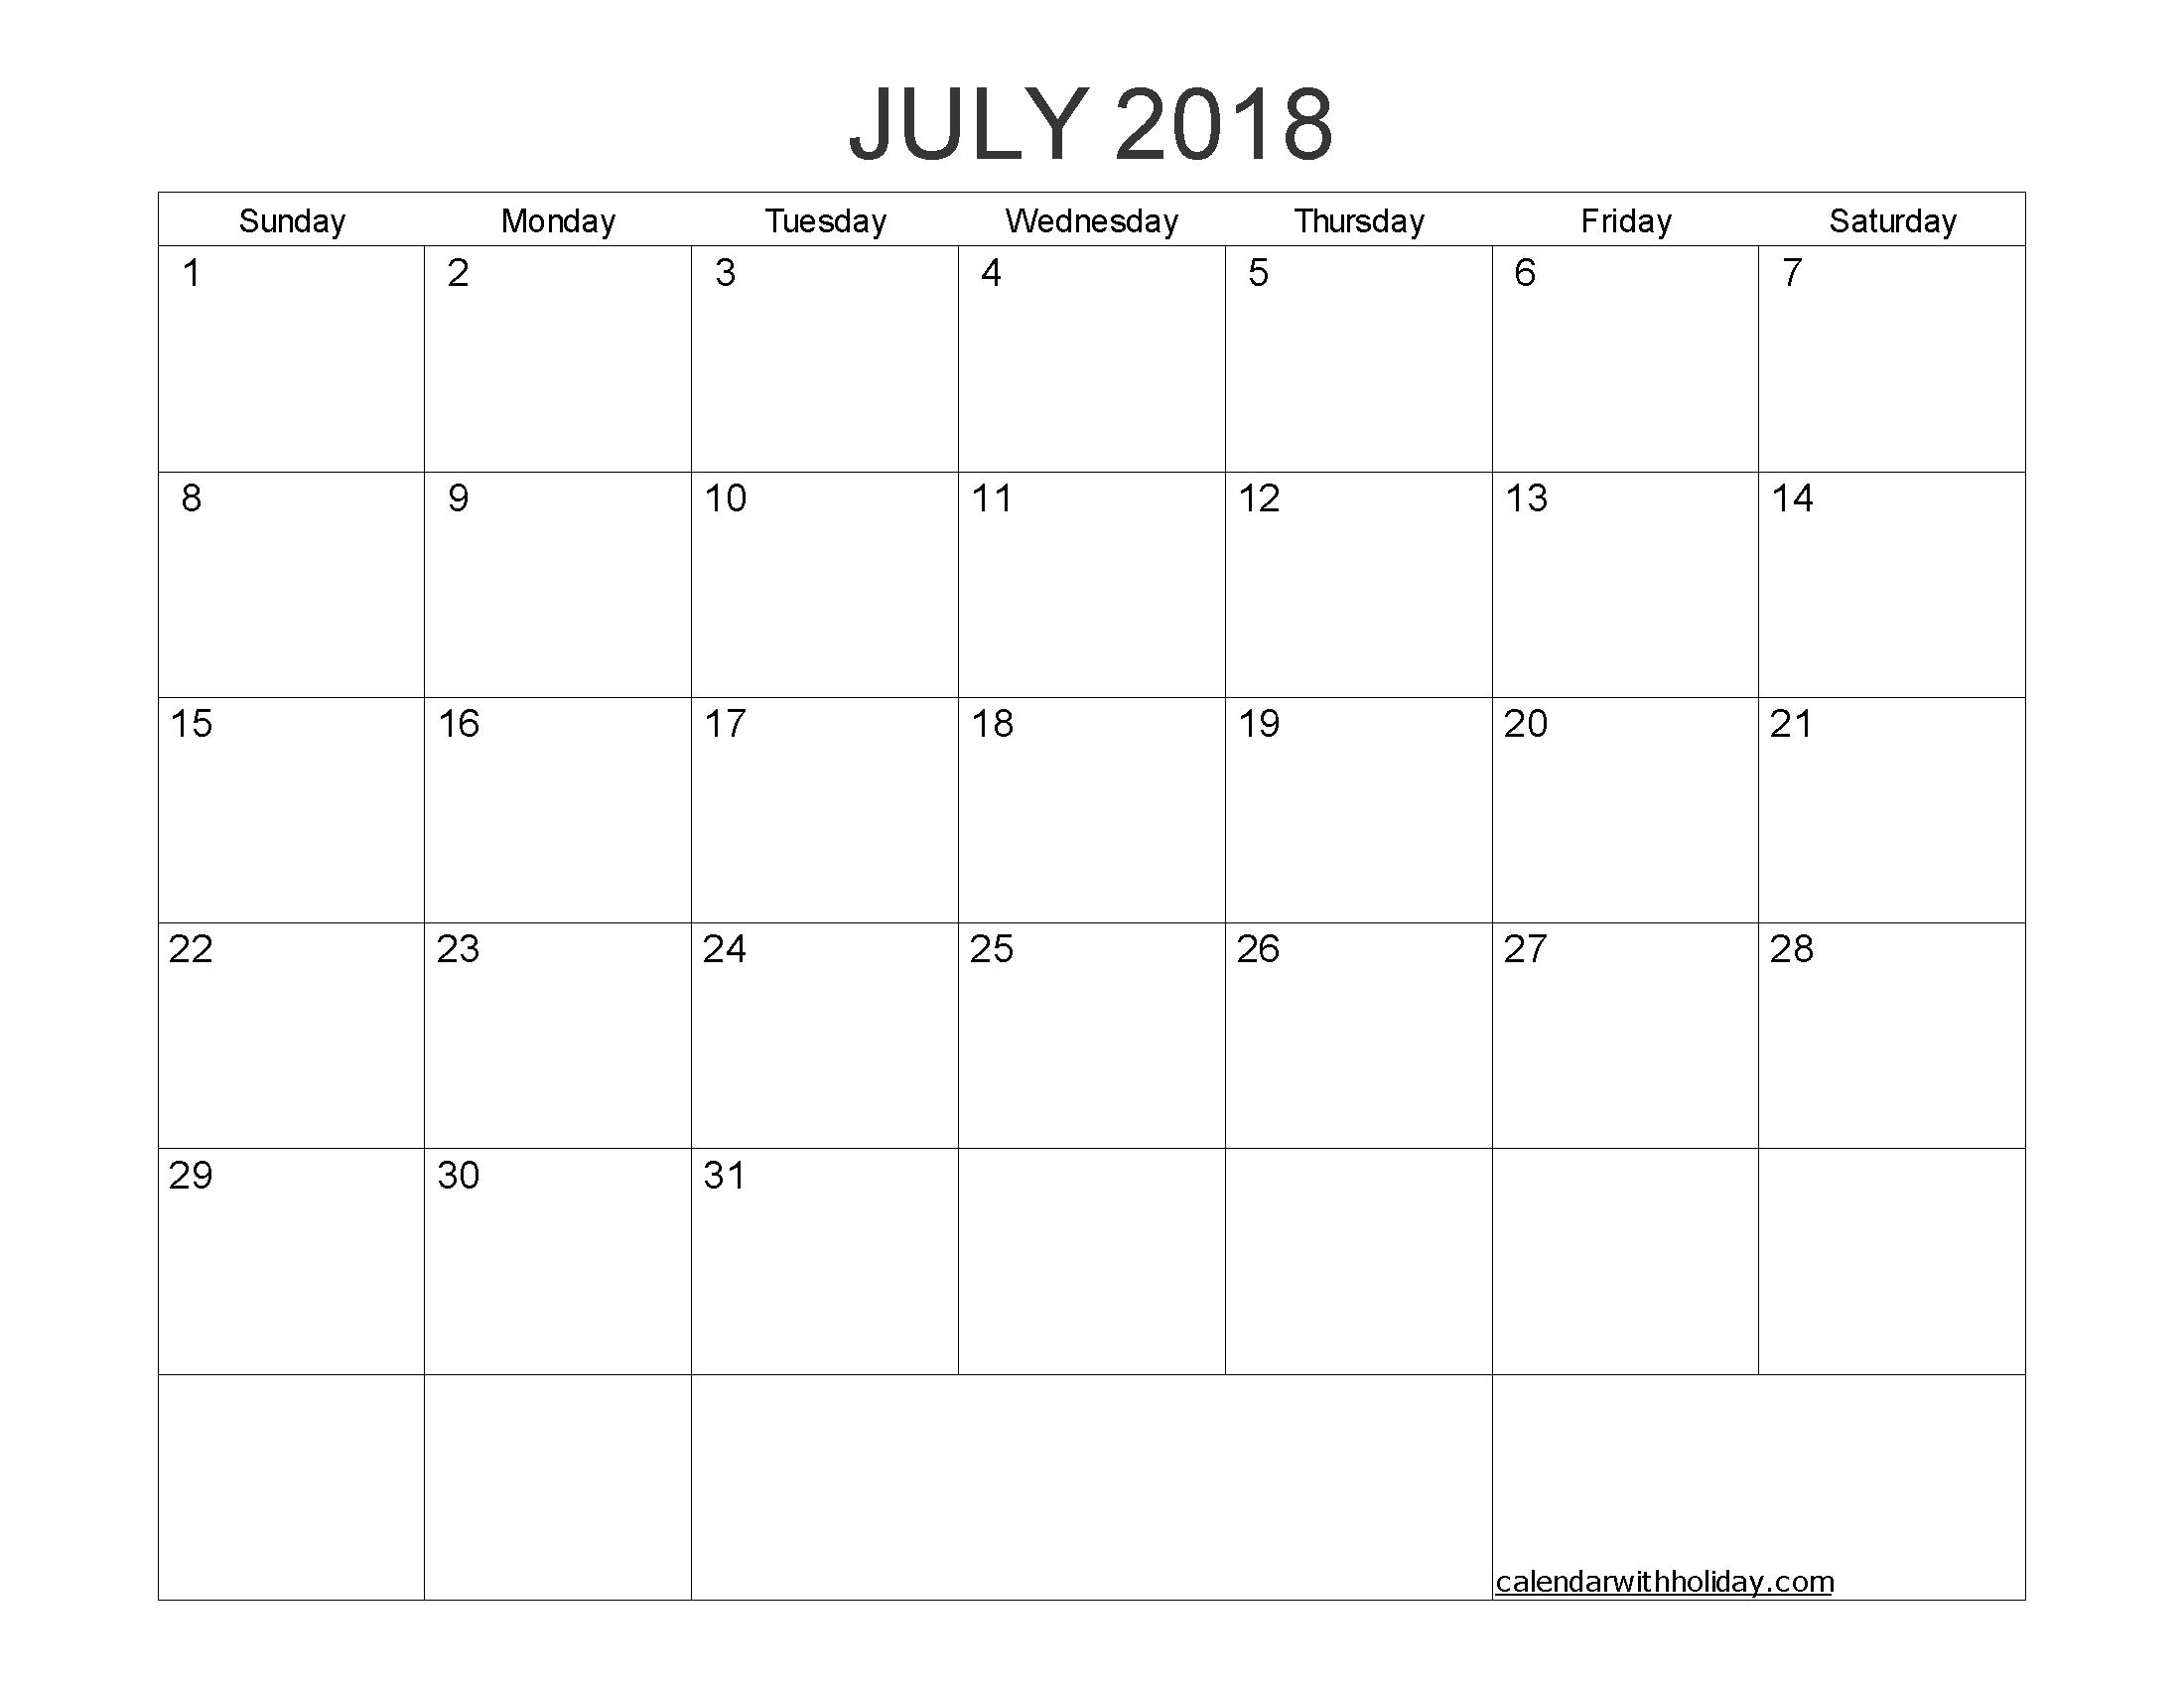 july 2018 blank calendar printable pdf  word  image